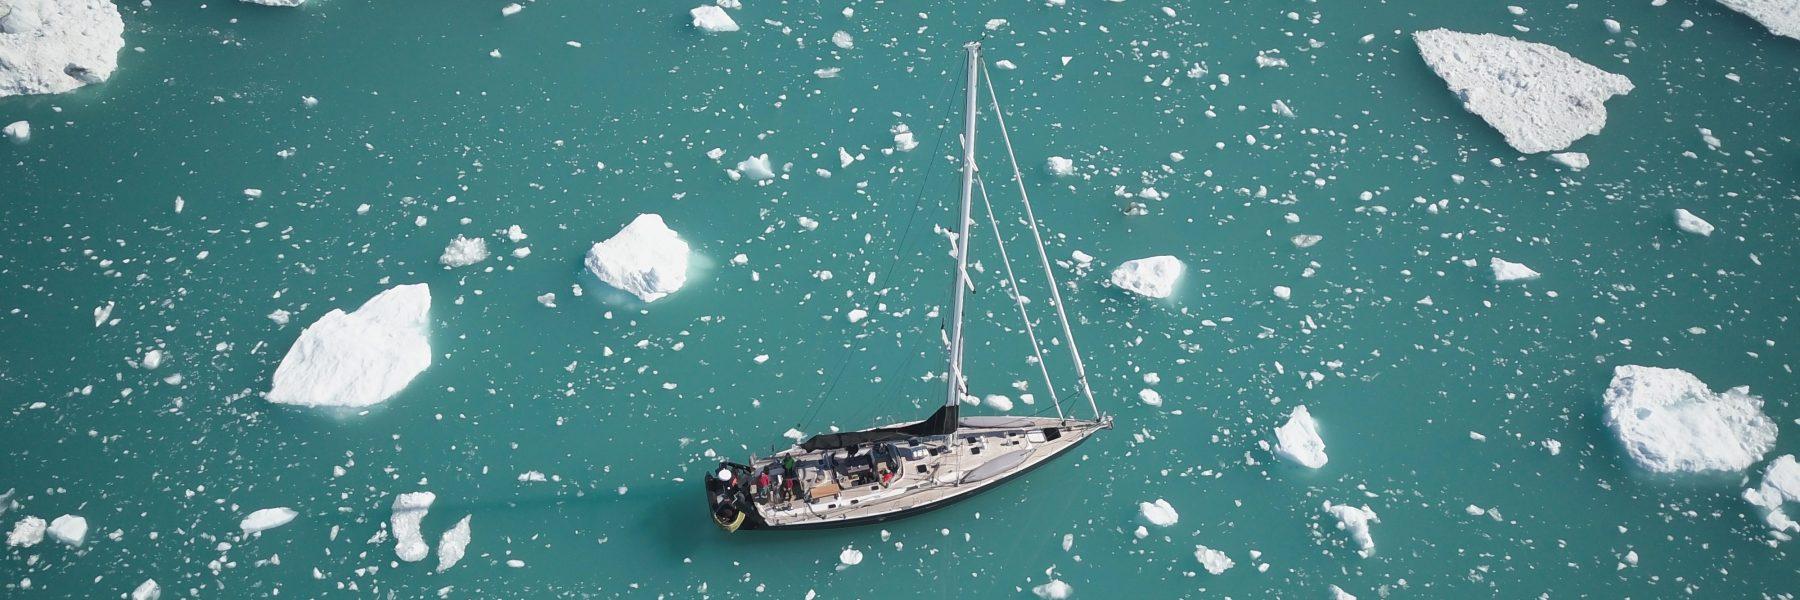 LifeSong Sailing